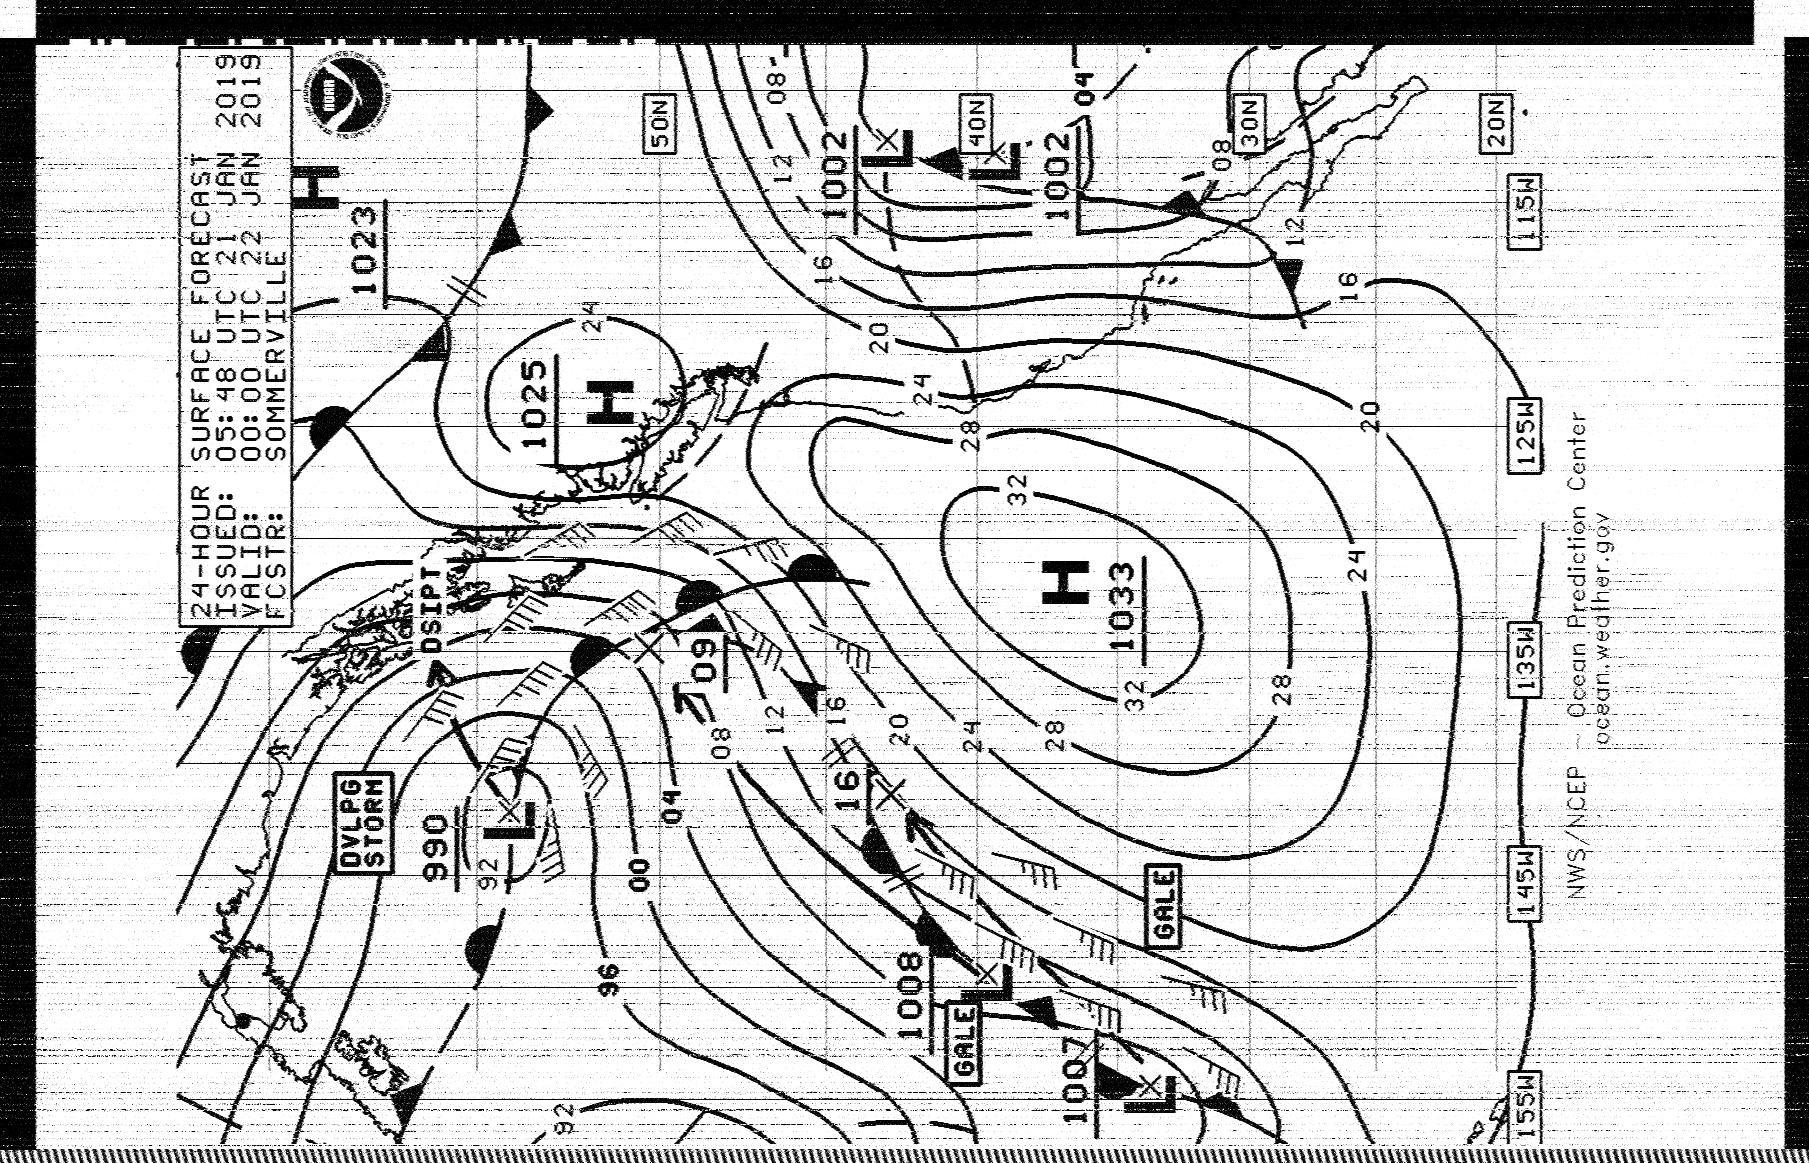 radiofax nmc pt reyes california national weather